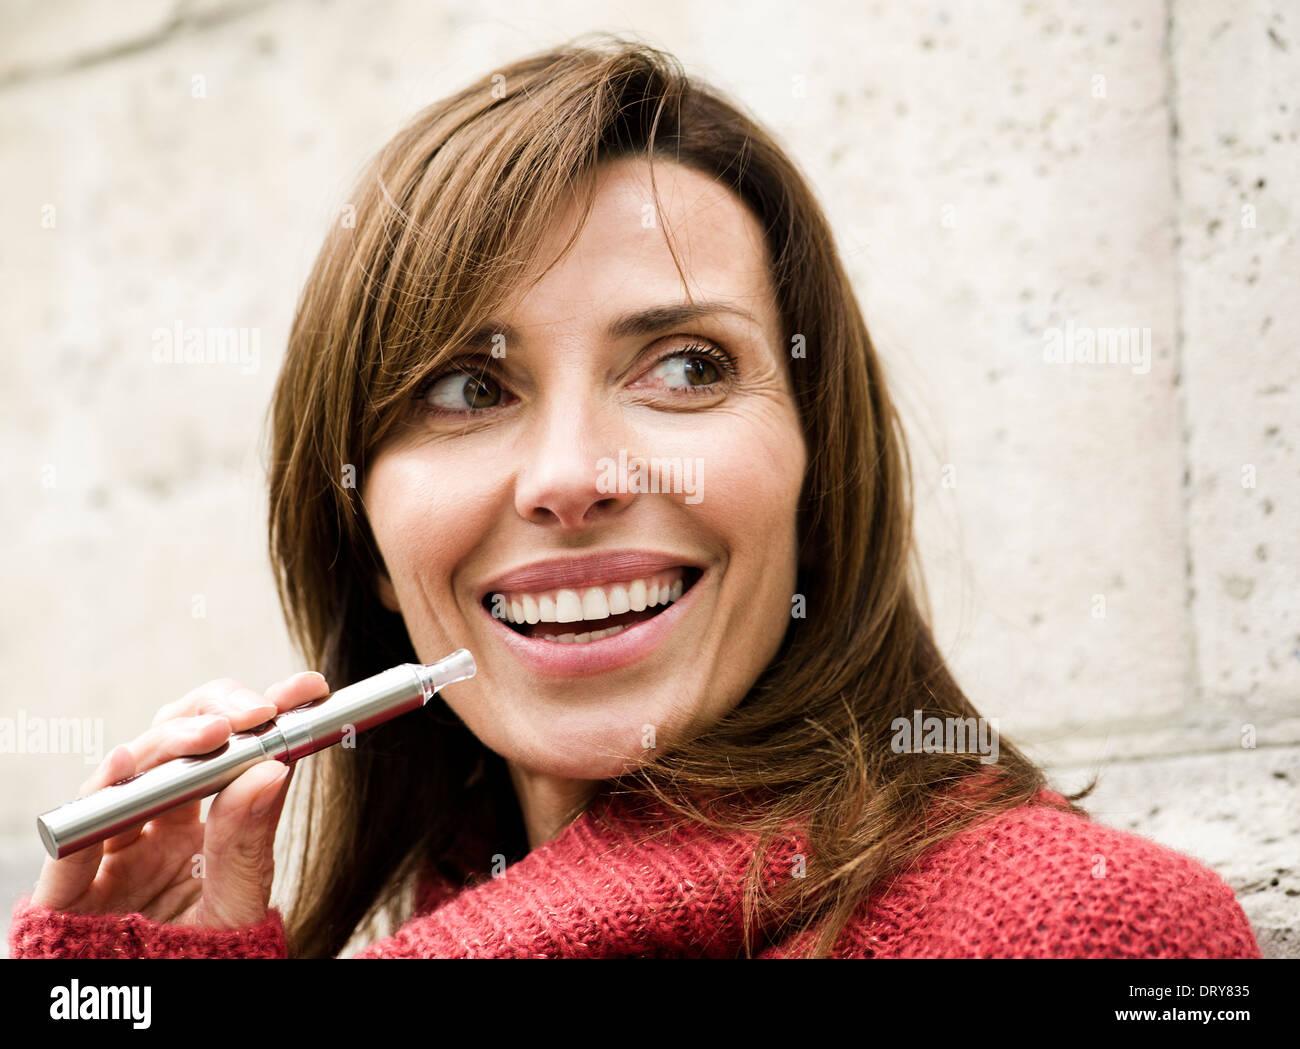 Frau rauchen elektronische Zigarette, Lächeln Stockbild